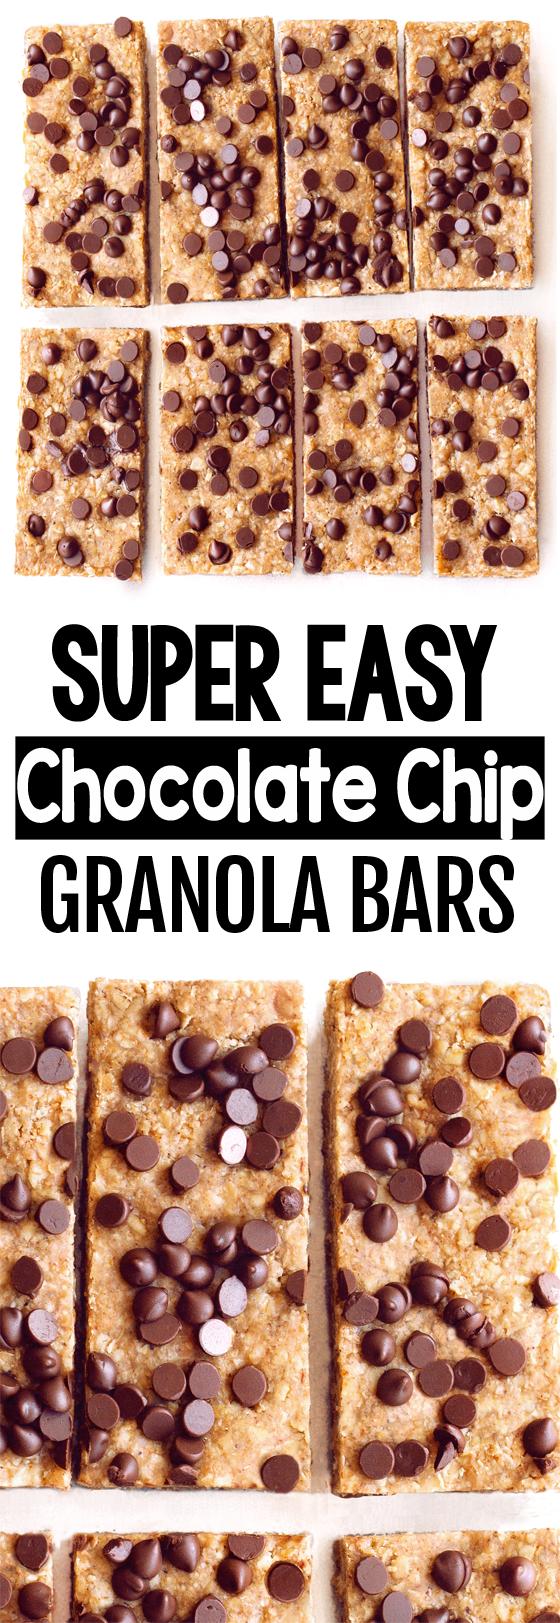 Healthy Homemade Chewy Granola Bar Recipe